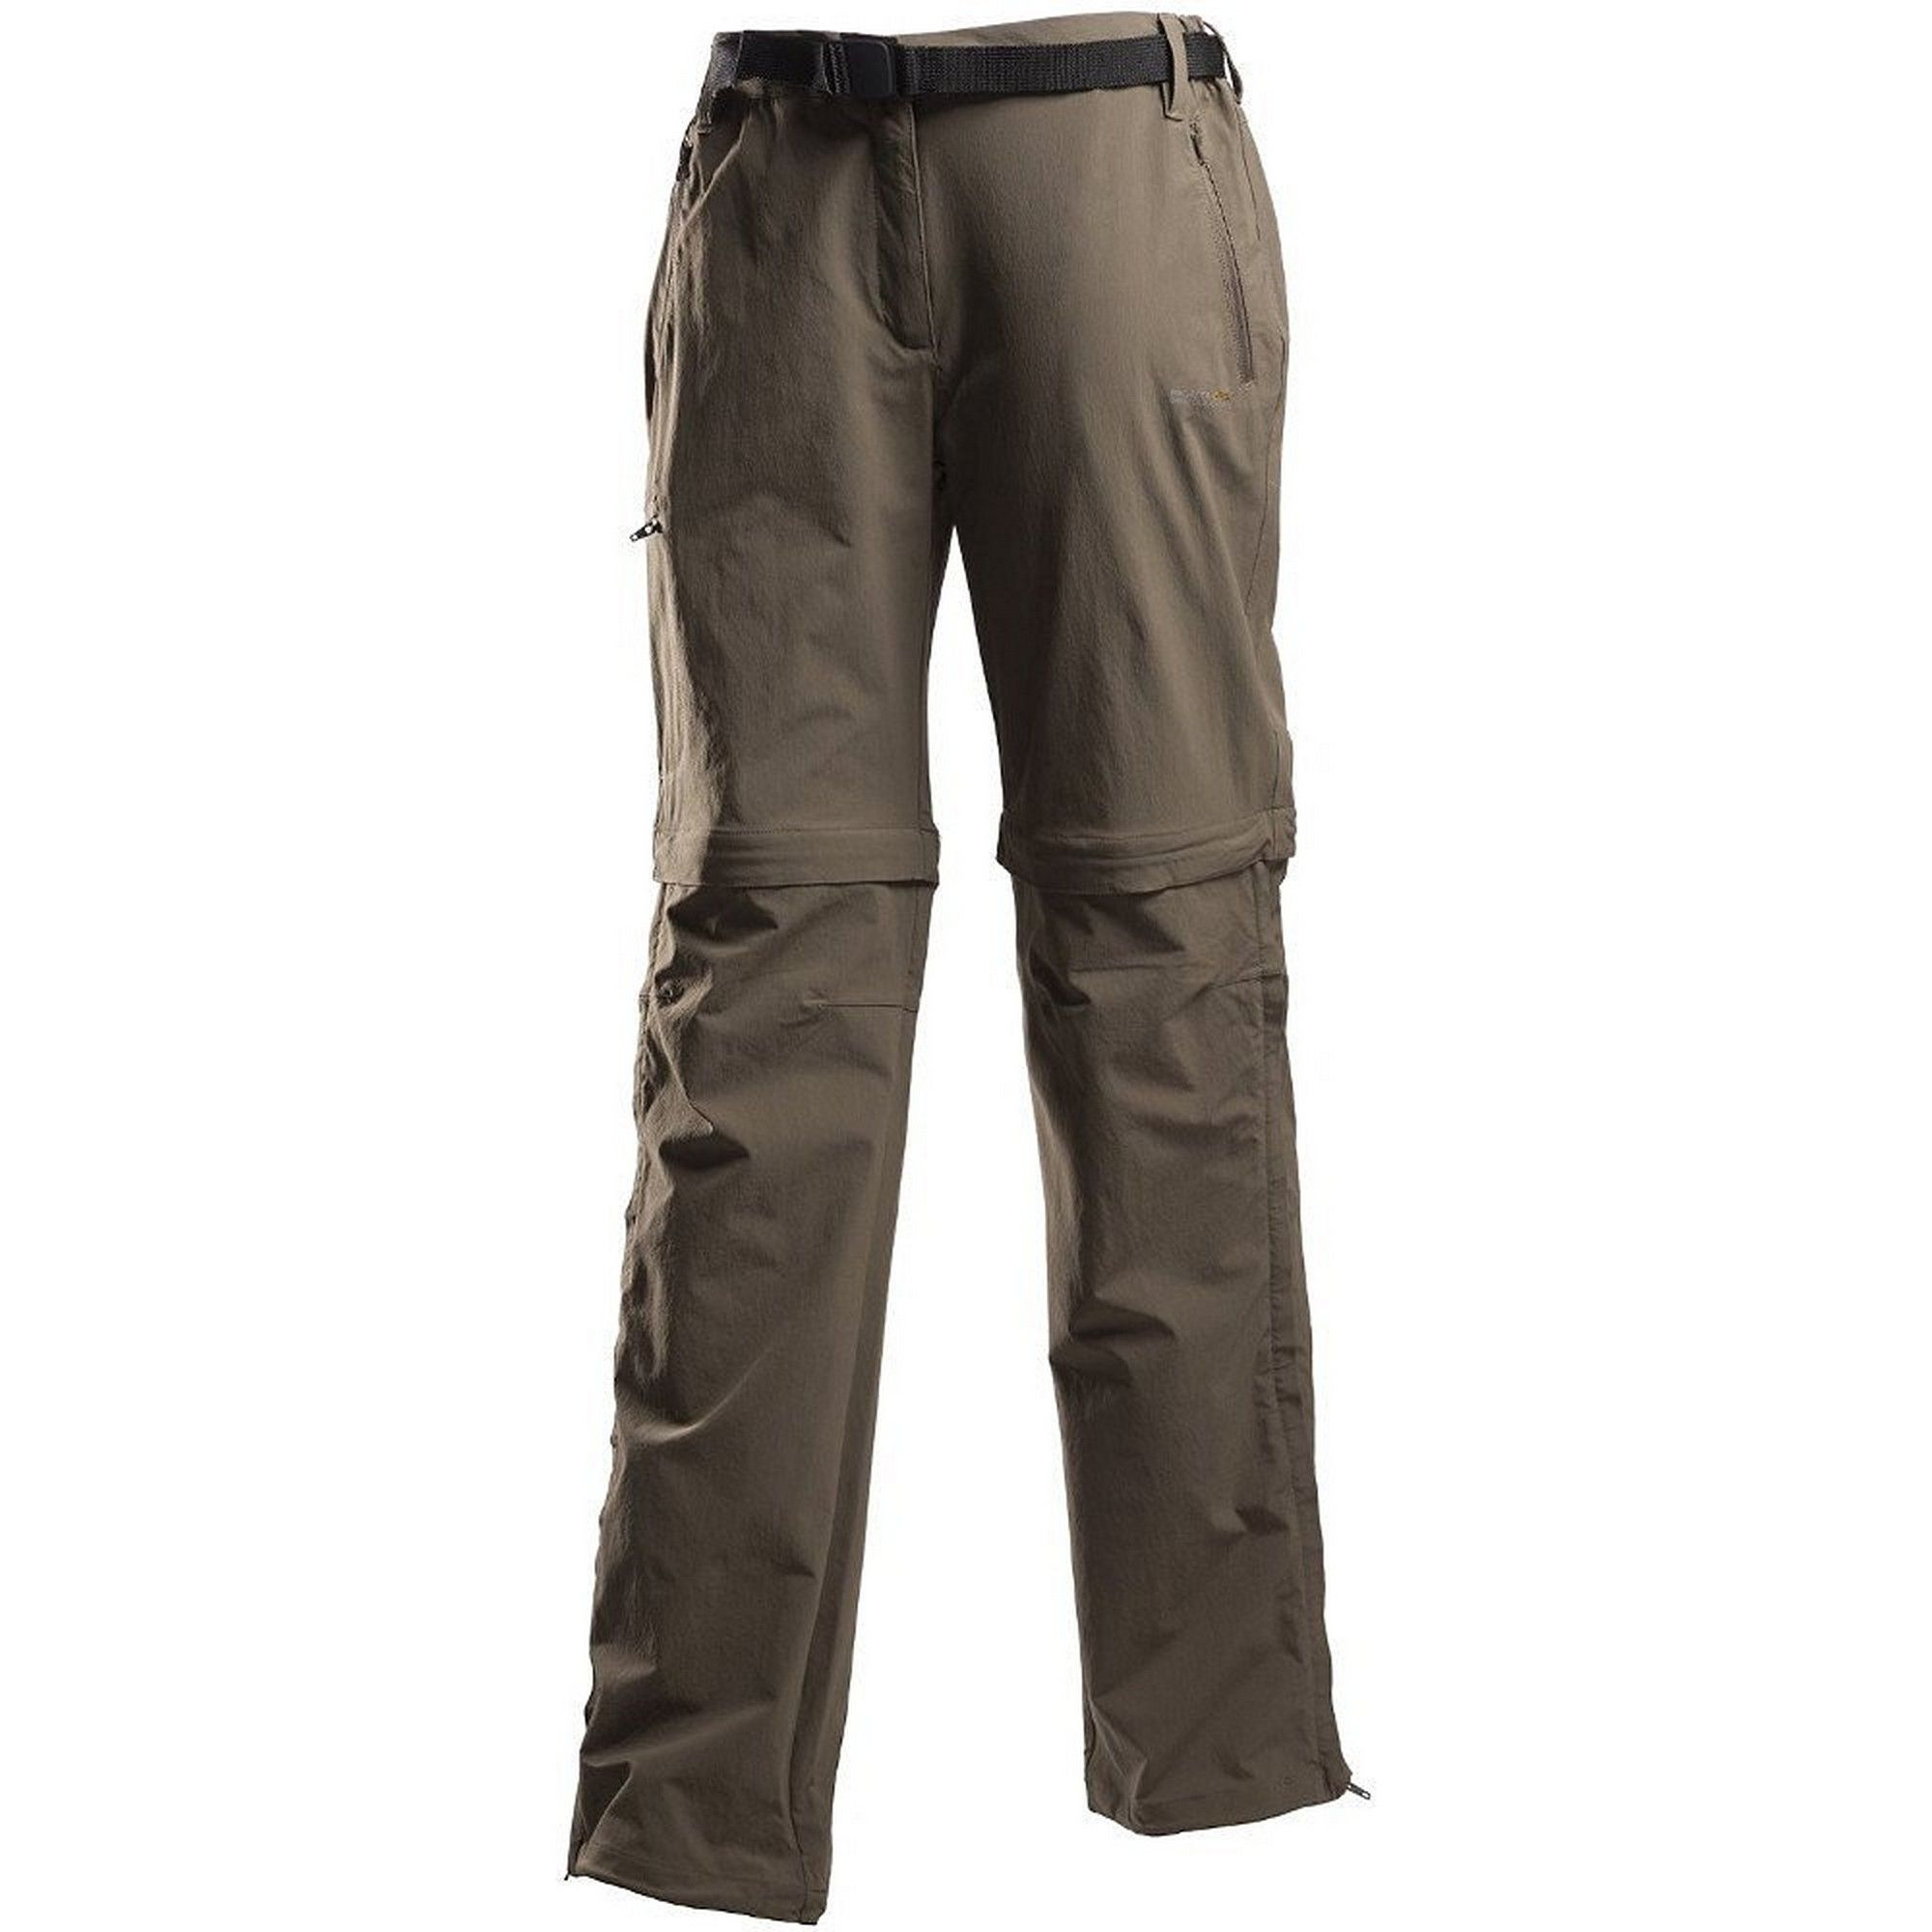 Regatta Great Outdoors Womens/Ladies Xert II Quick Drying Convertible Walking Trousers